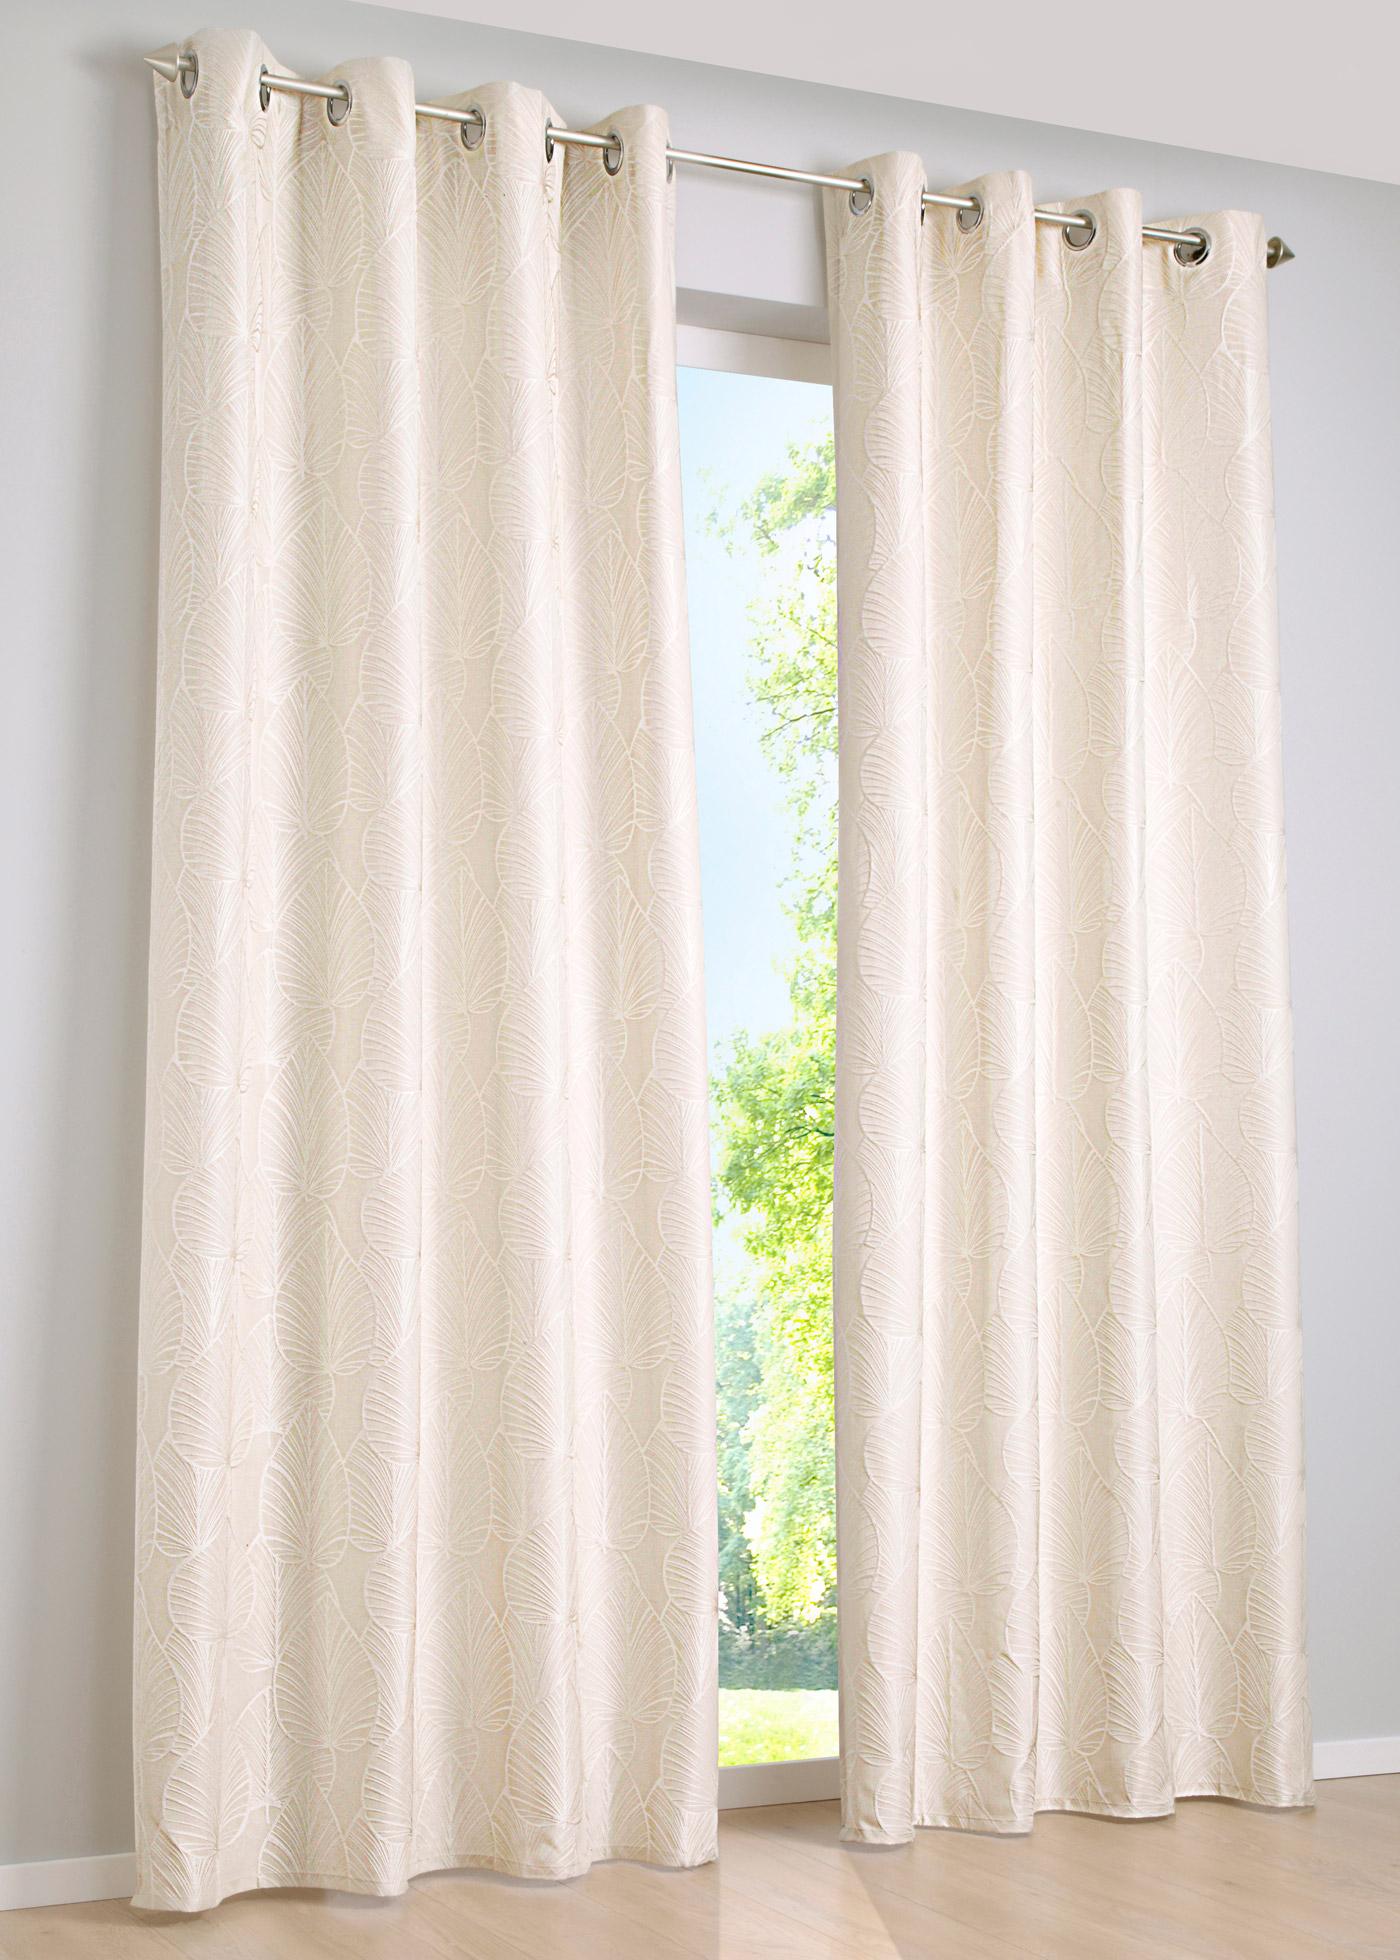 Garderobenpaneele bpc living preisvergleiche - Bonprix vorhang ...